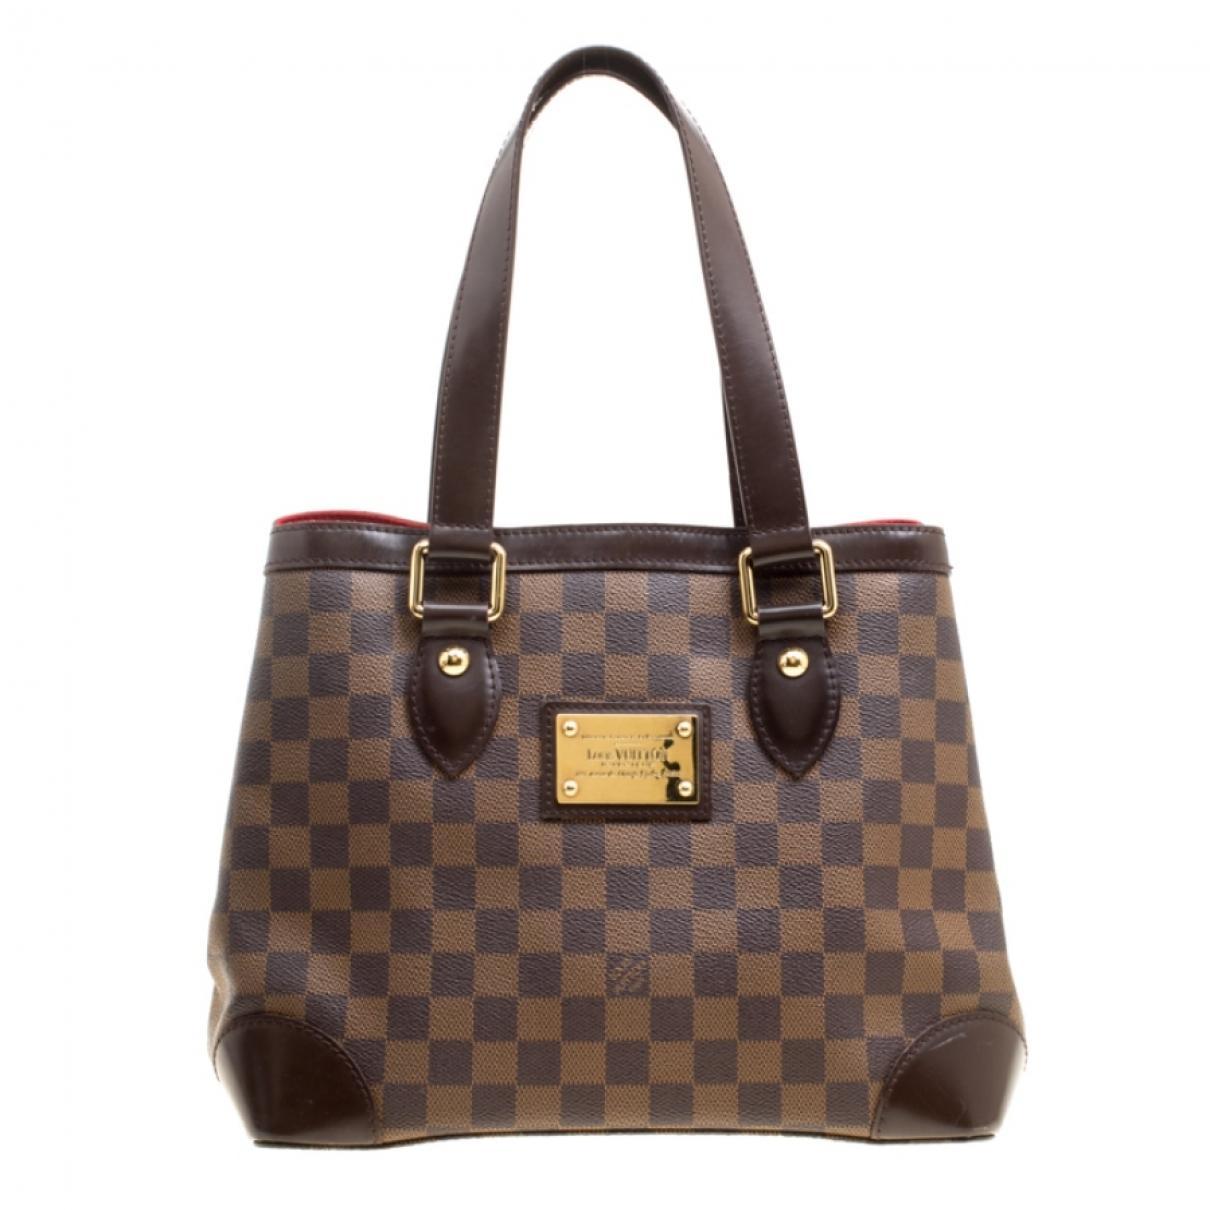 fea2db5fbc53 Lyst - Louis Vuitton Hampstead Brown Leather Handbag in Brown